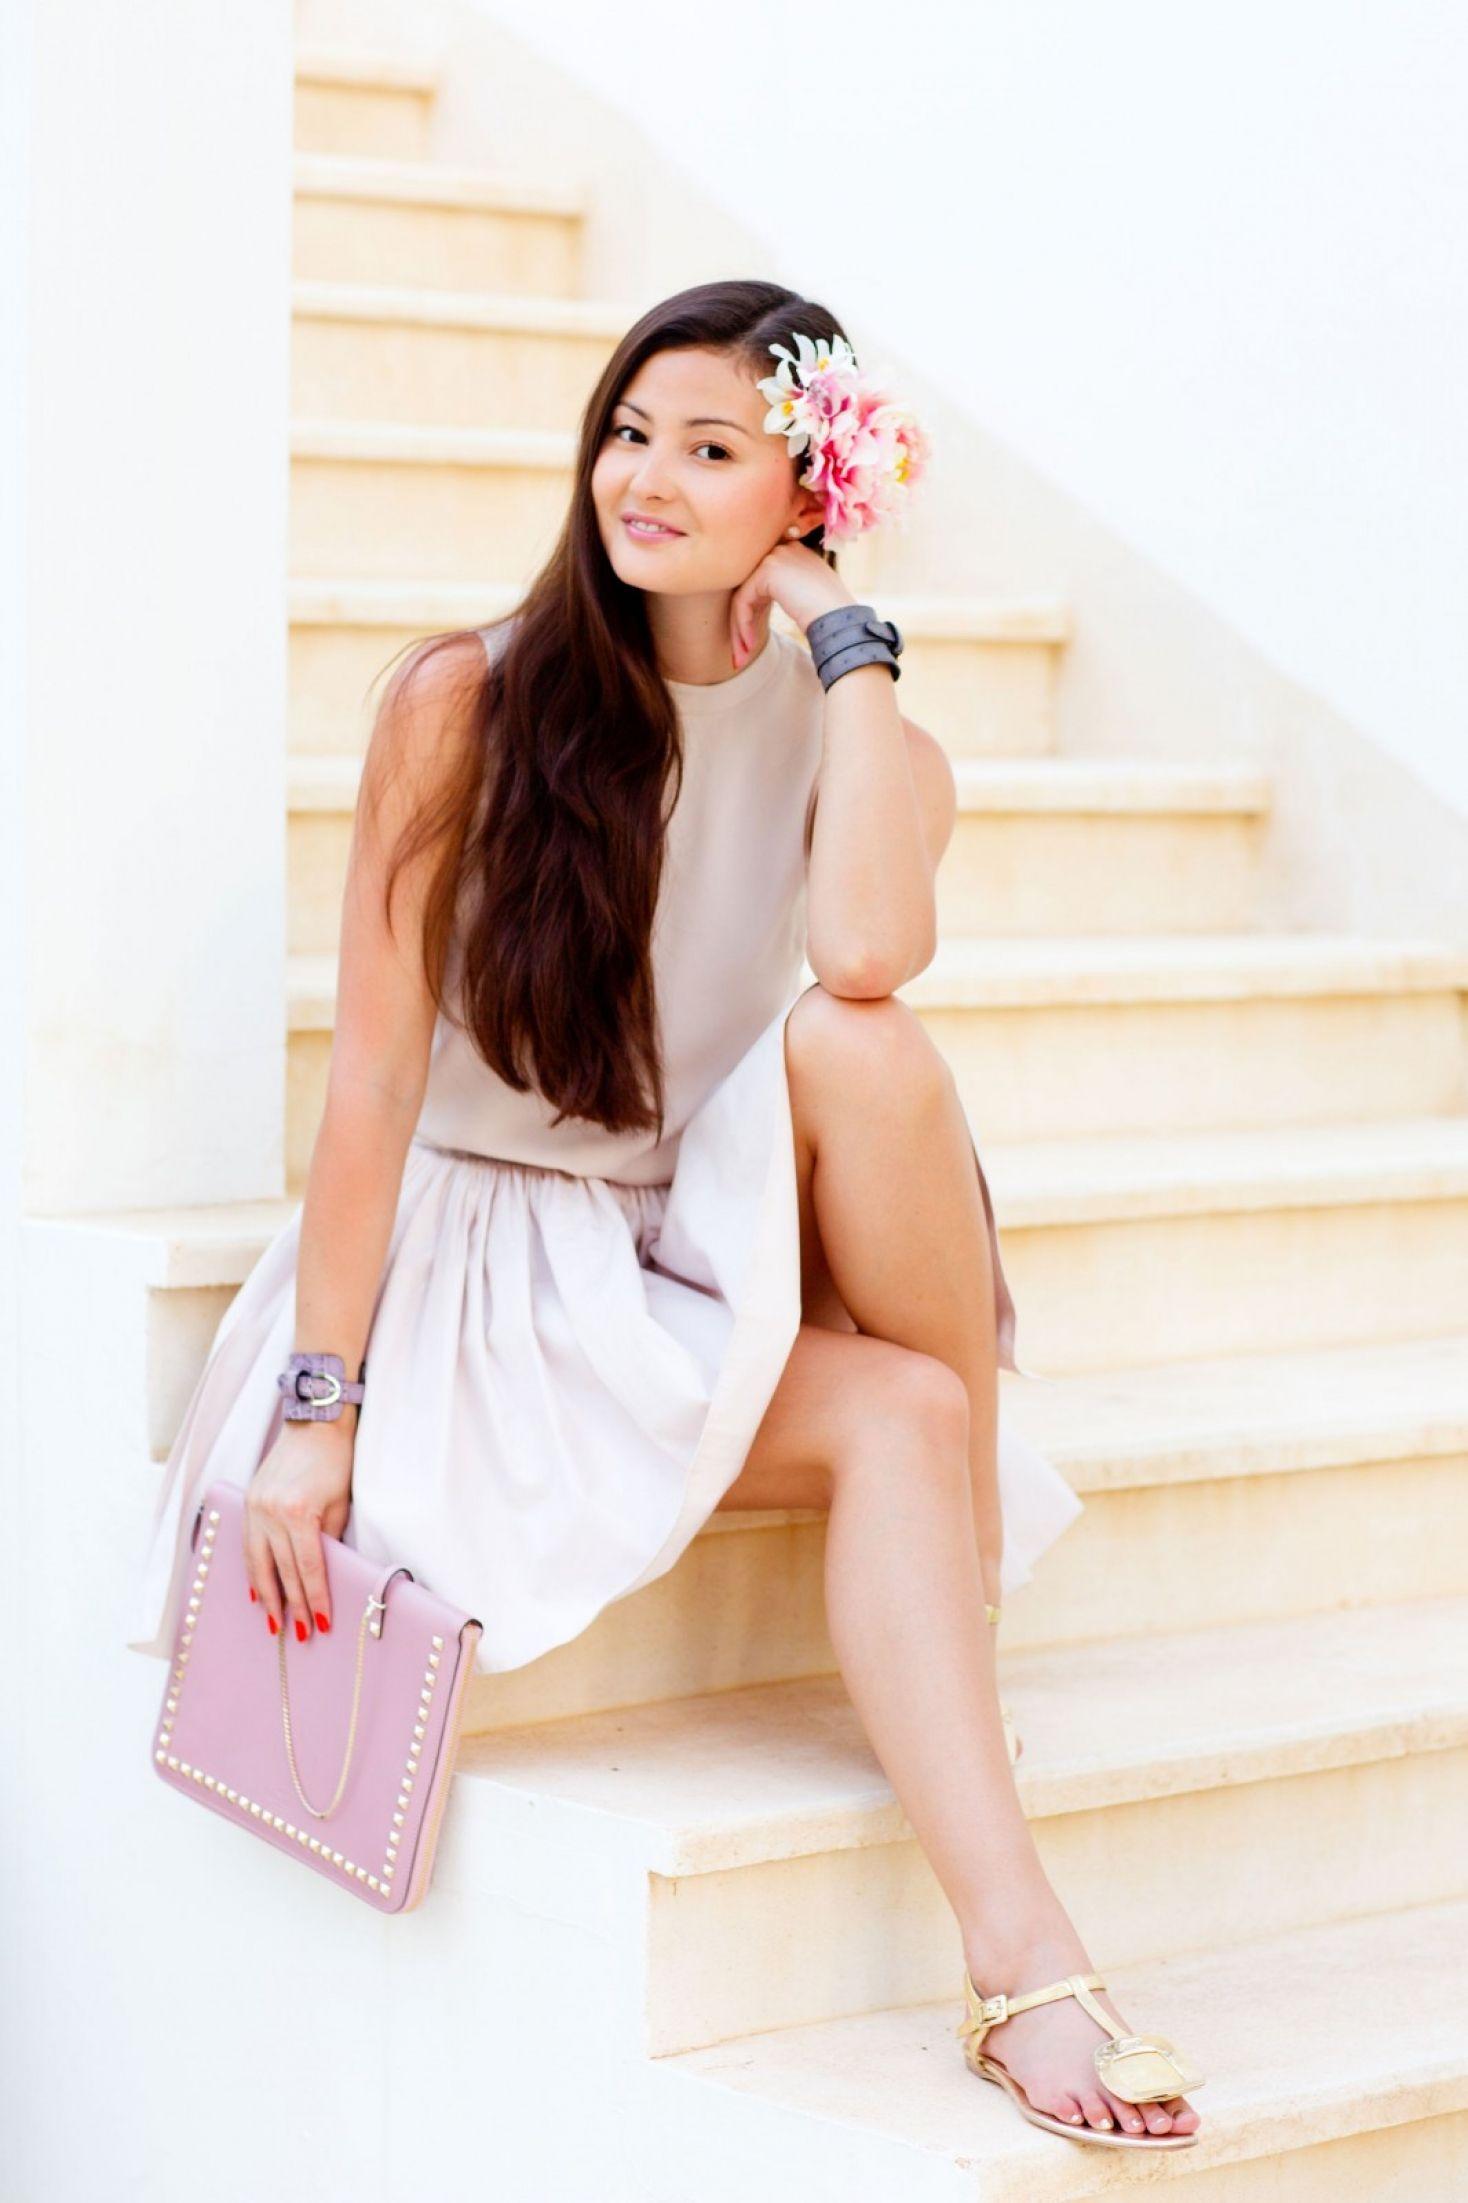 Peony Lim - Lovely honeymoon attire.